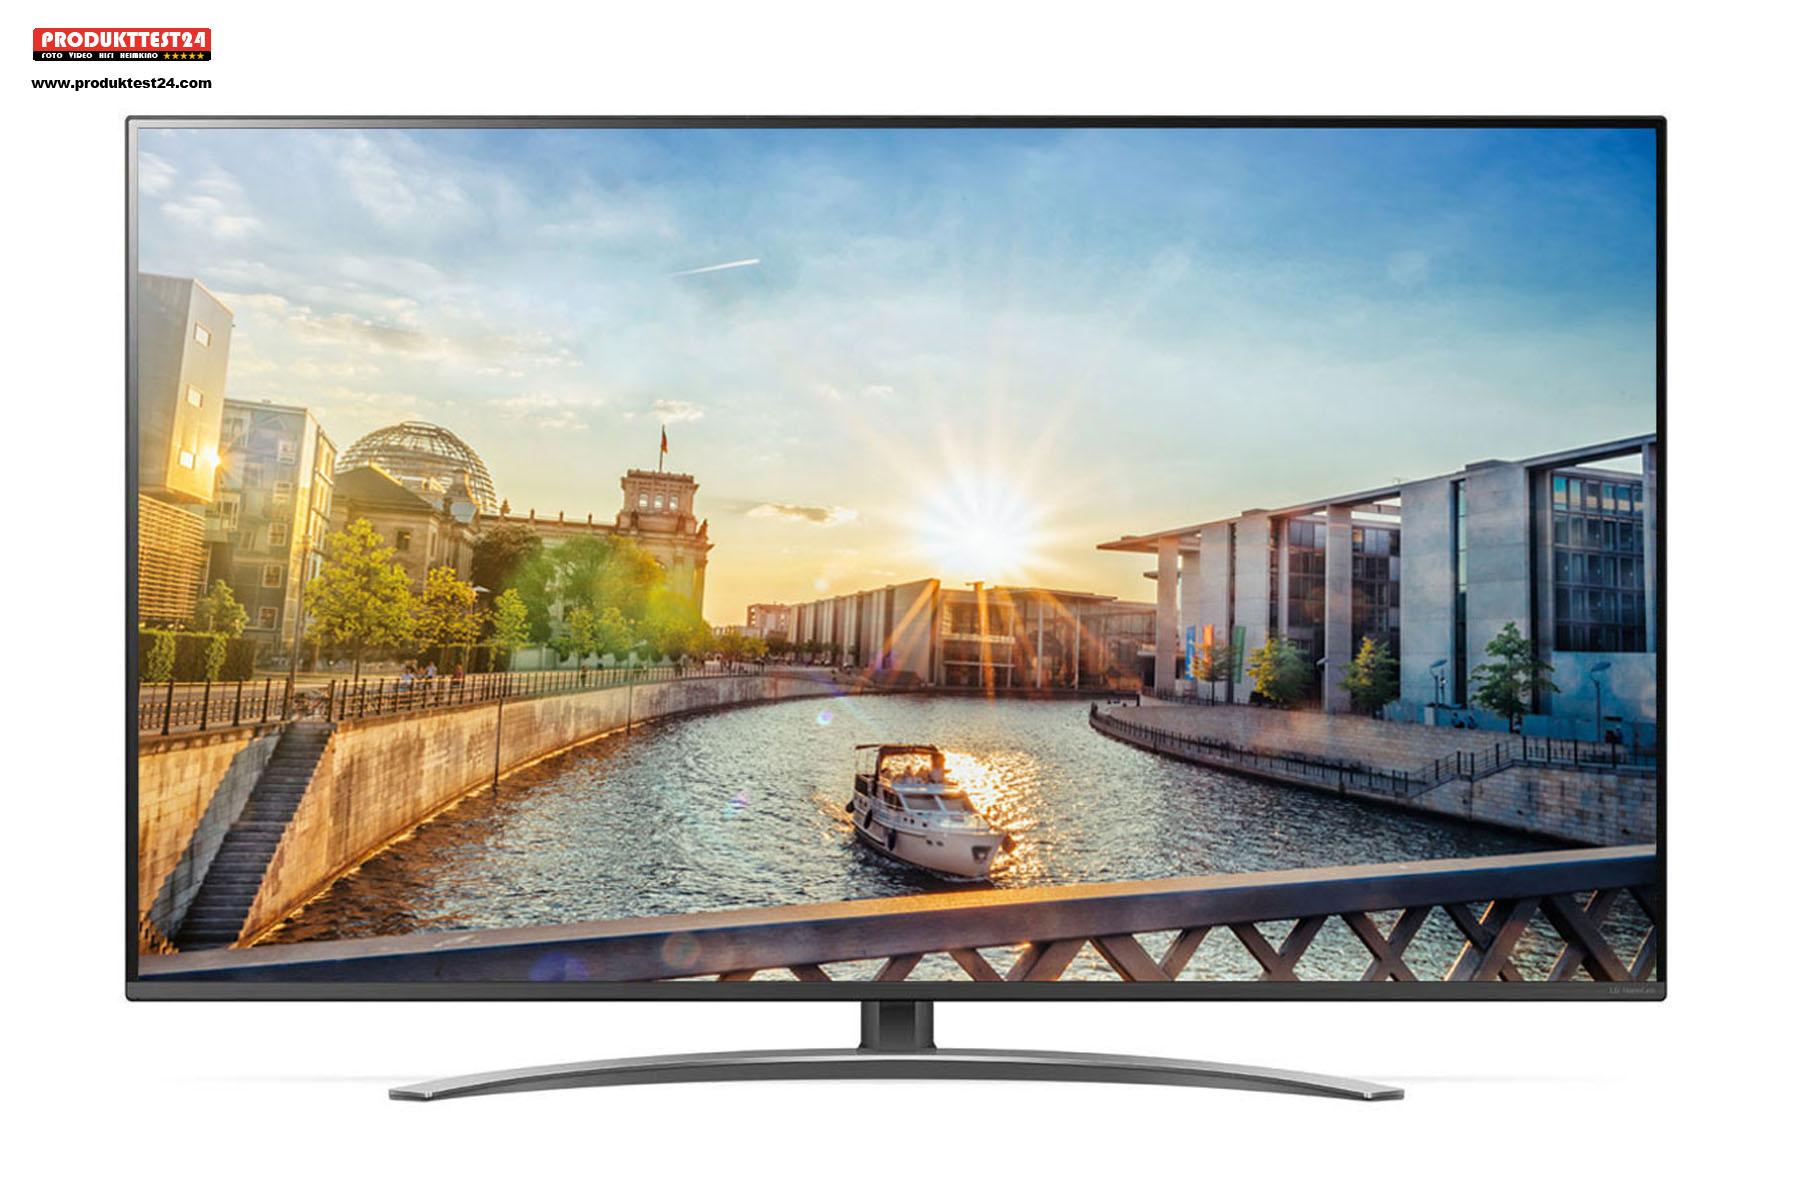 55 Zoll UHD 4K Fernseher mit Nanozellen